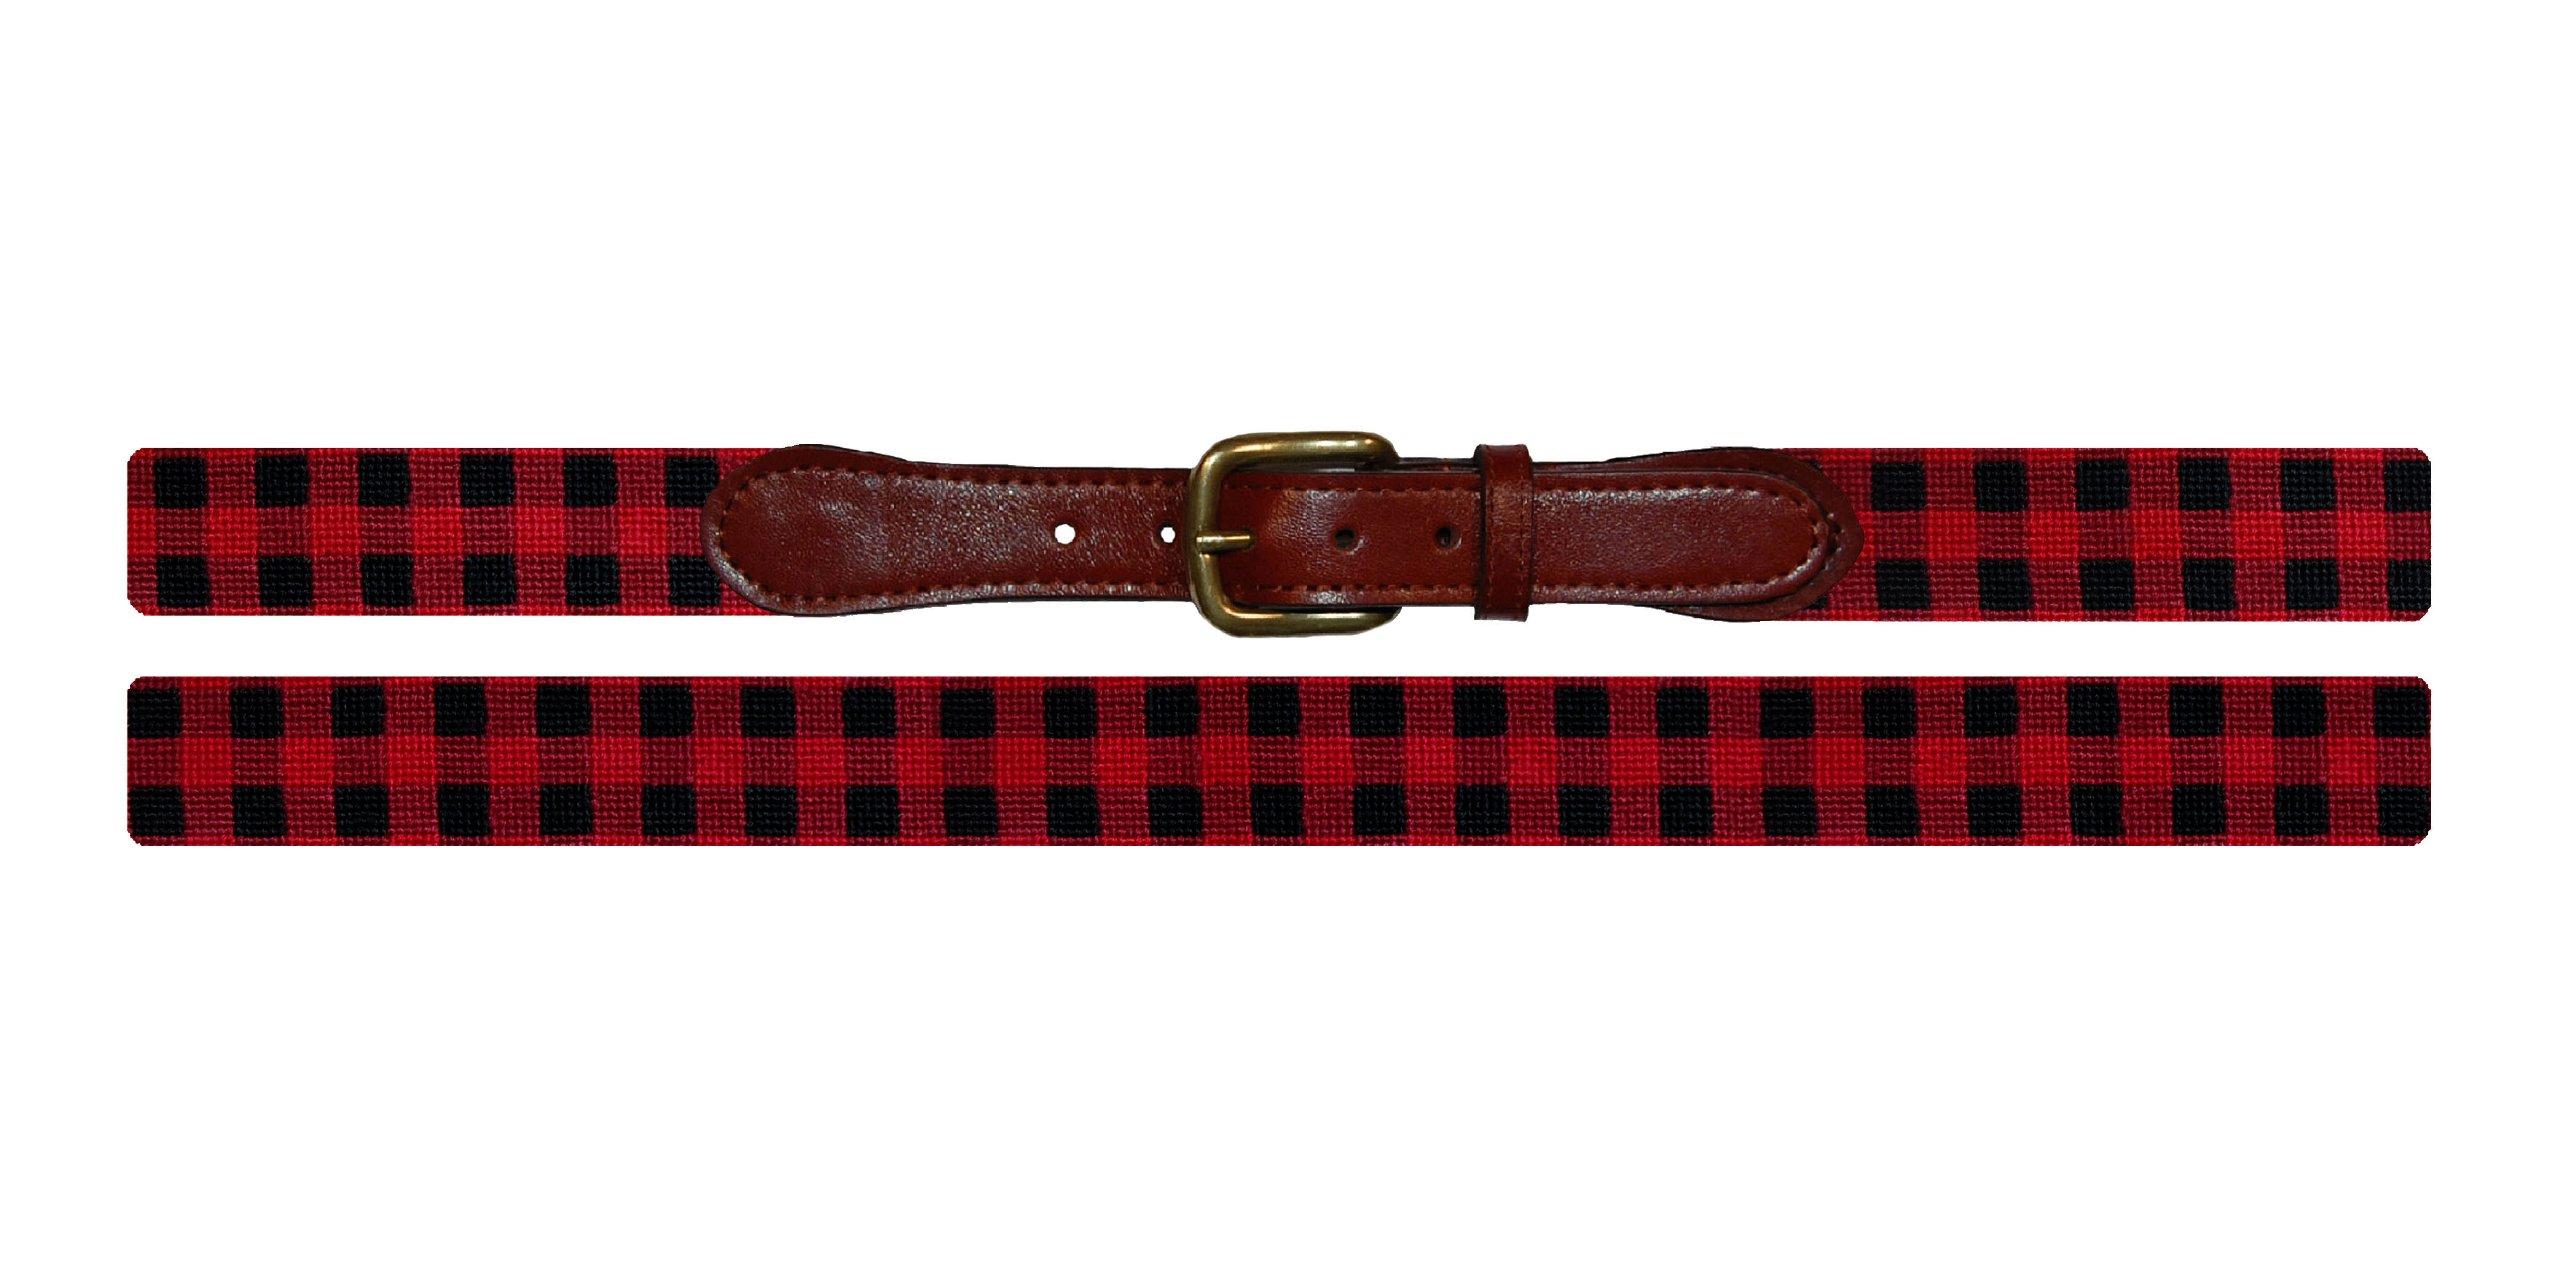 Smathers & Branson Lumberjack Plaid Needlepoint Belt, Multi - 38 (B-209-38)